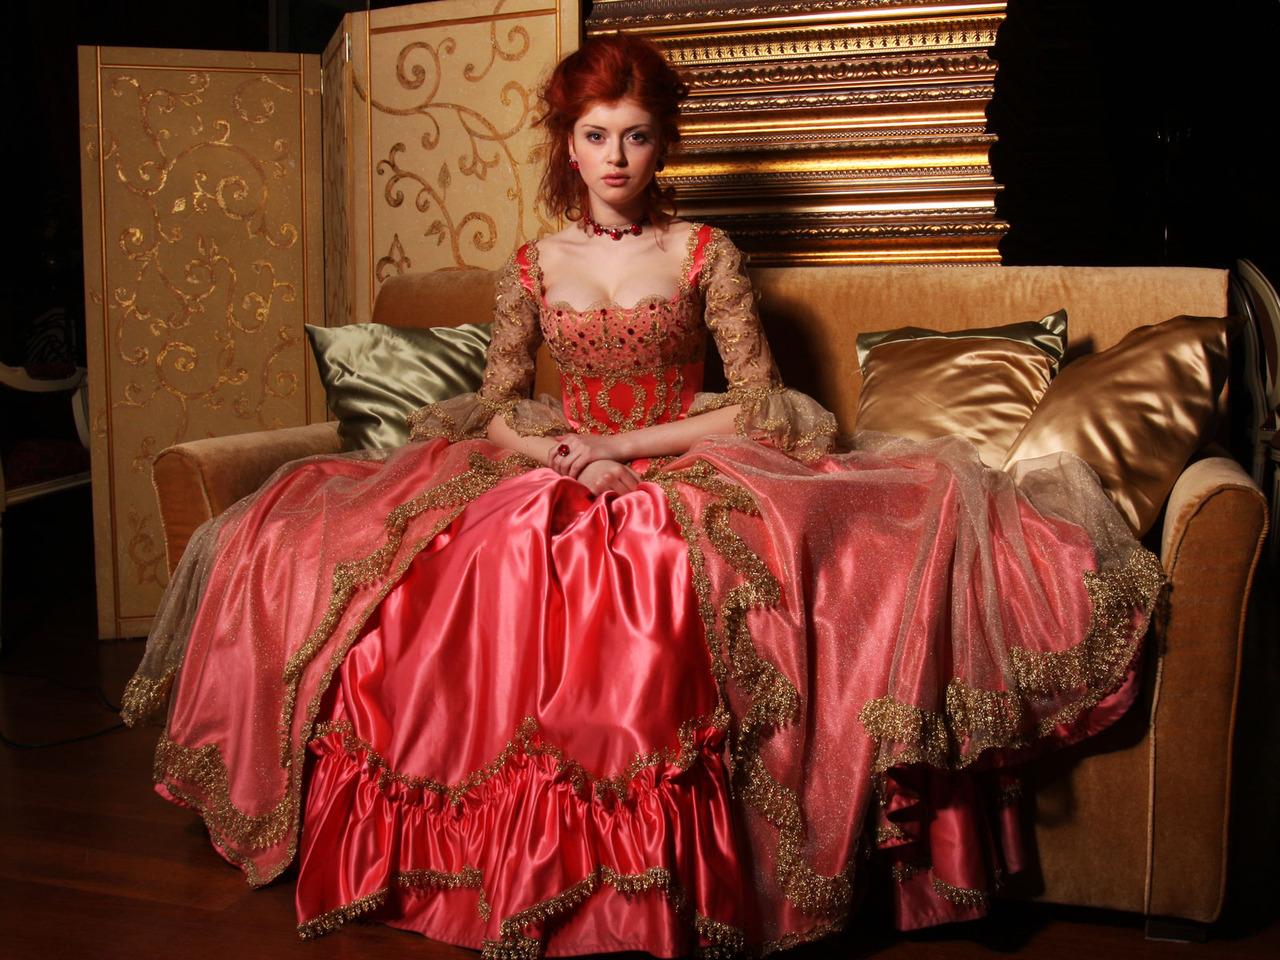 Платье 18 века с корсетом